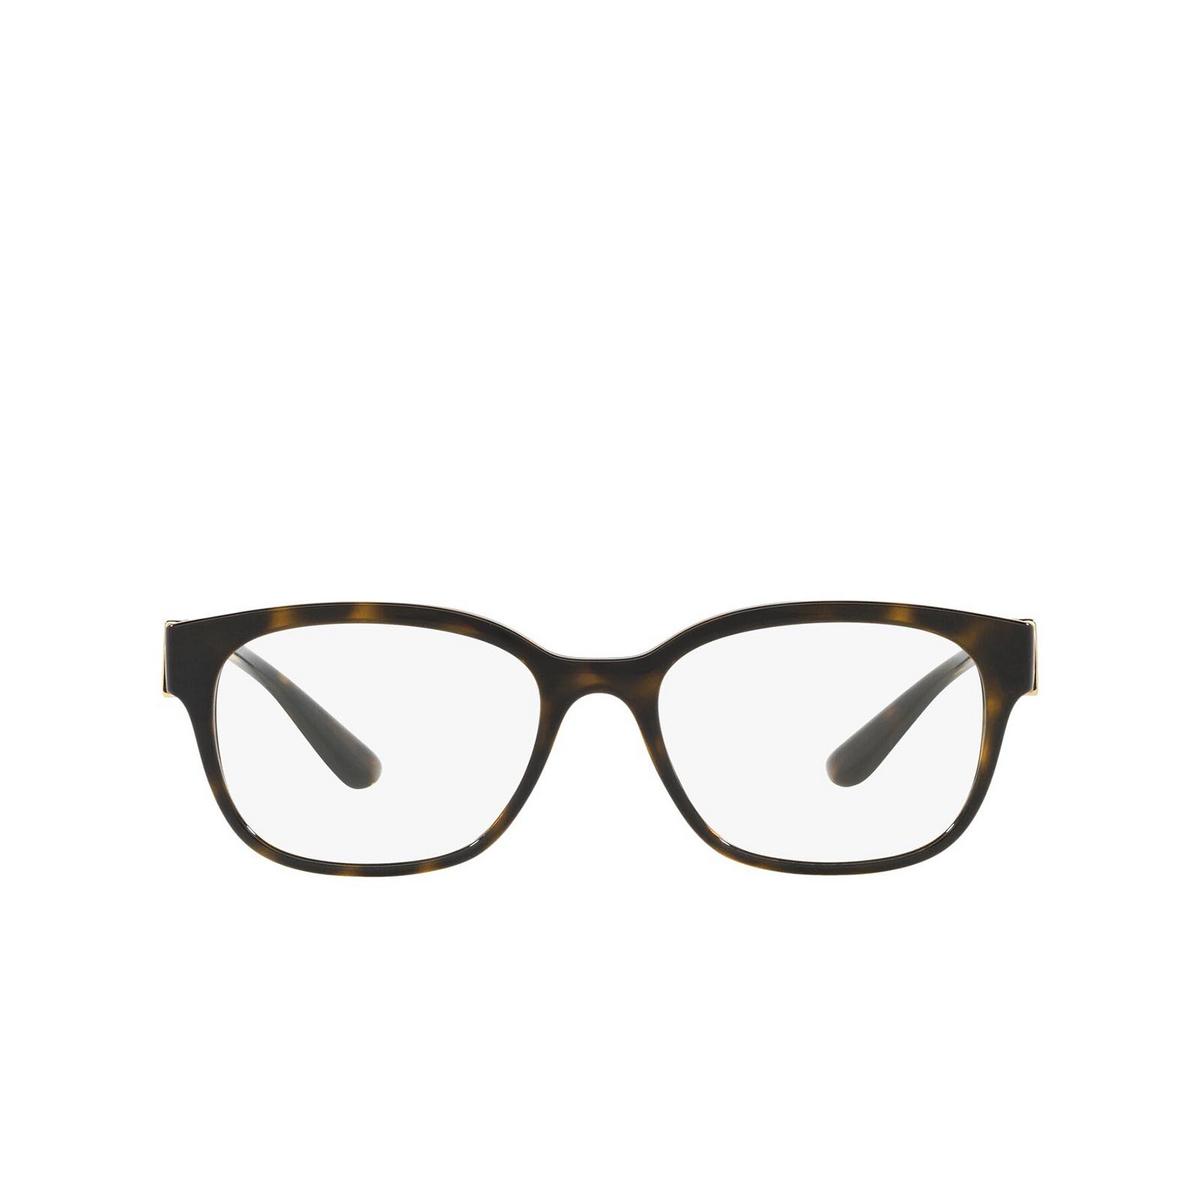 Dolce & Gabbana® Rectangle Eyeglasses: DG5066 color Havana 502 - front view.